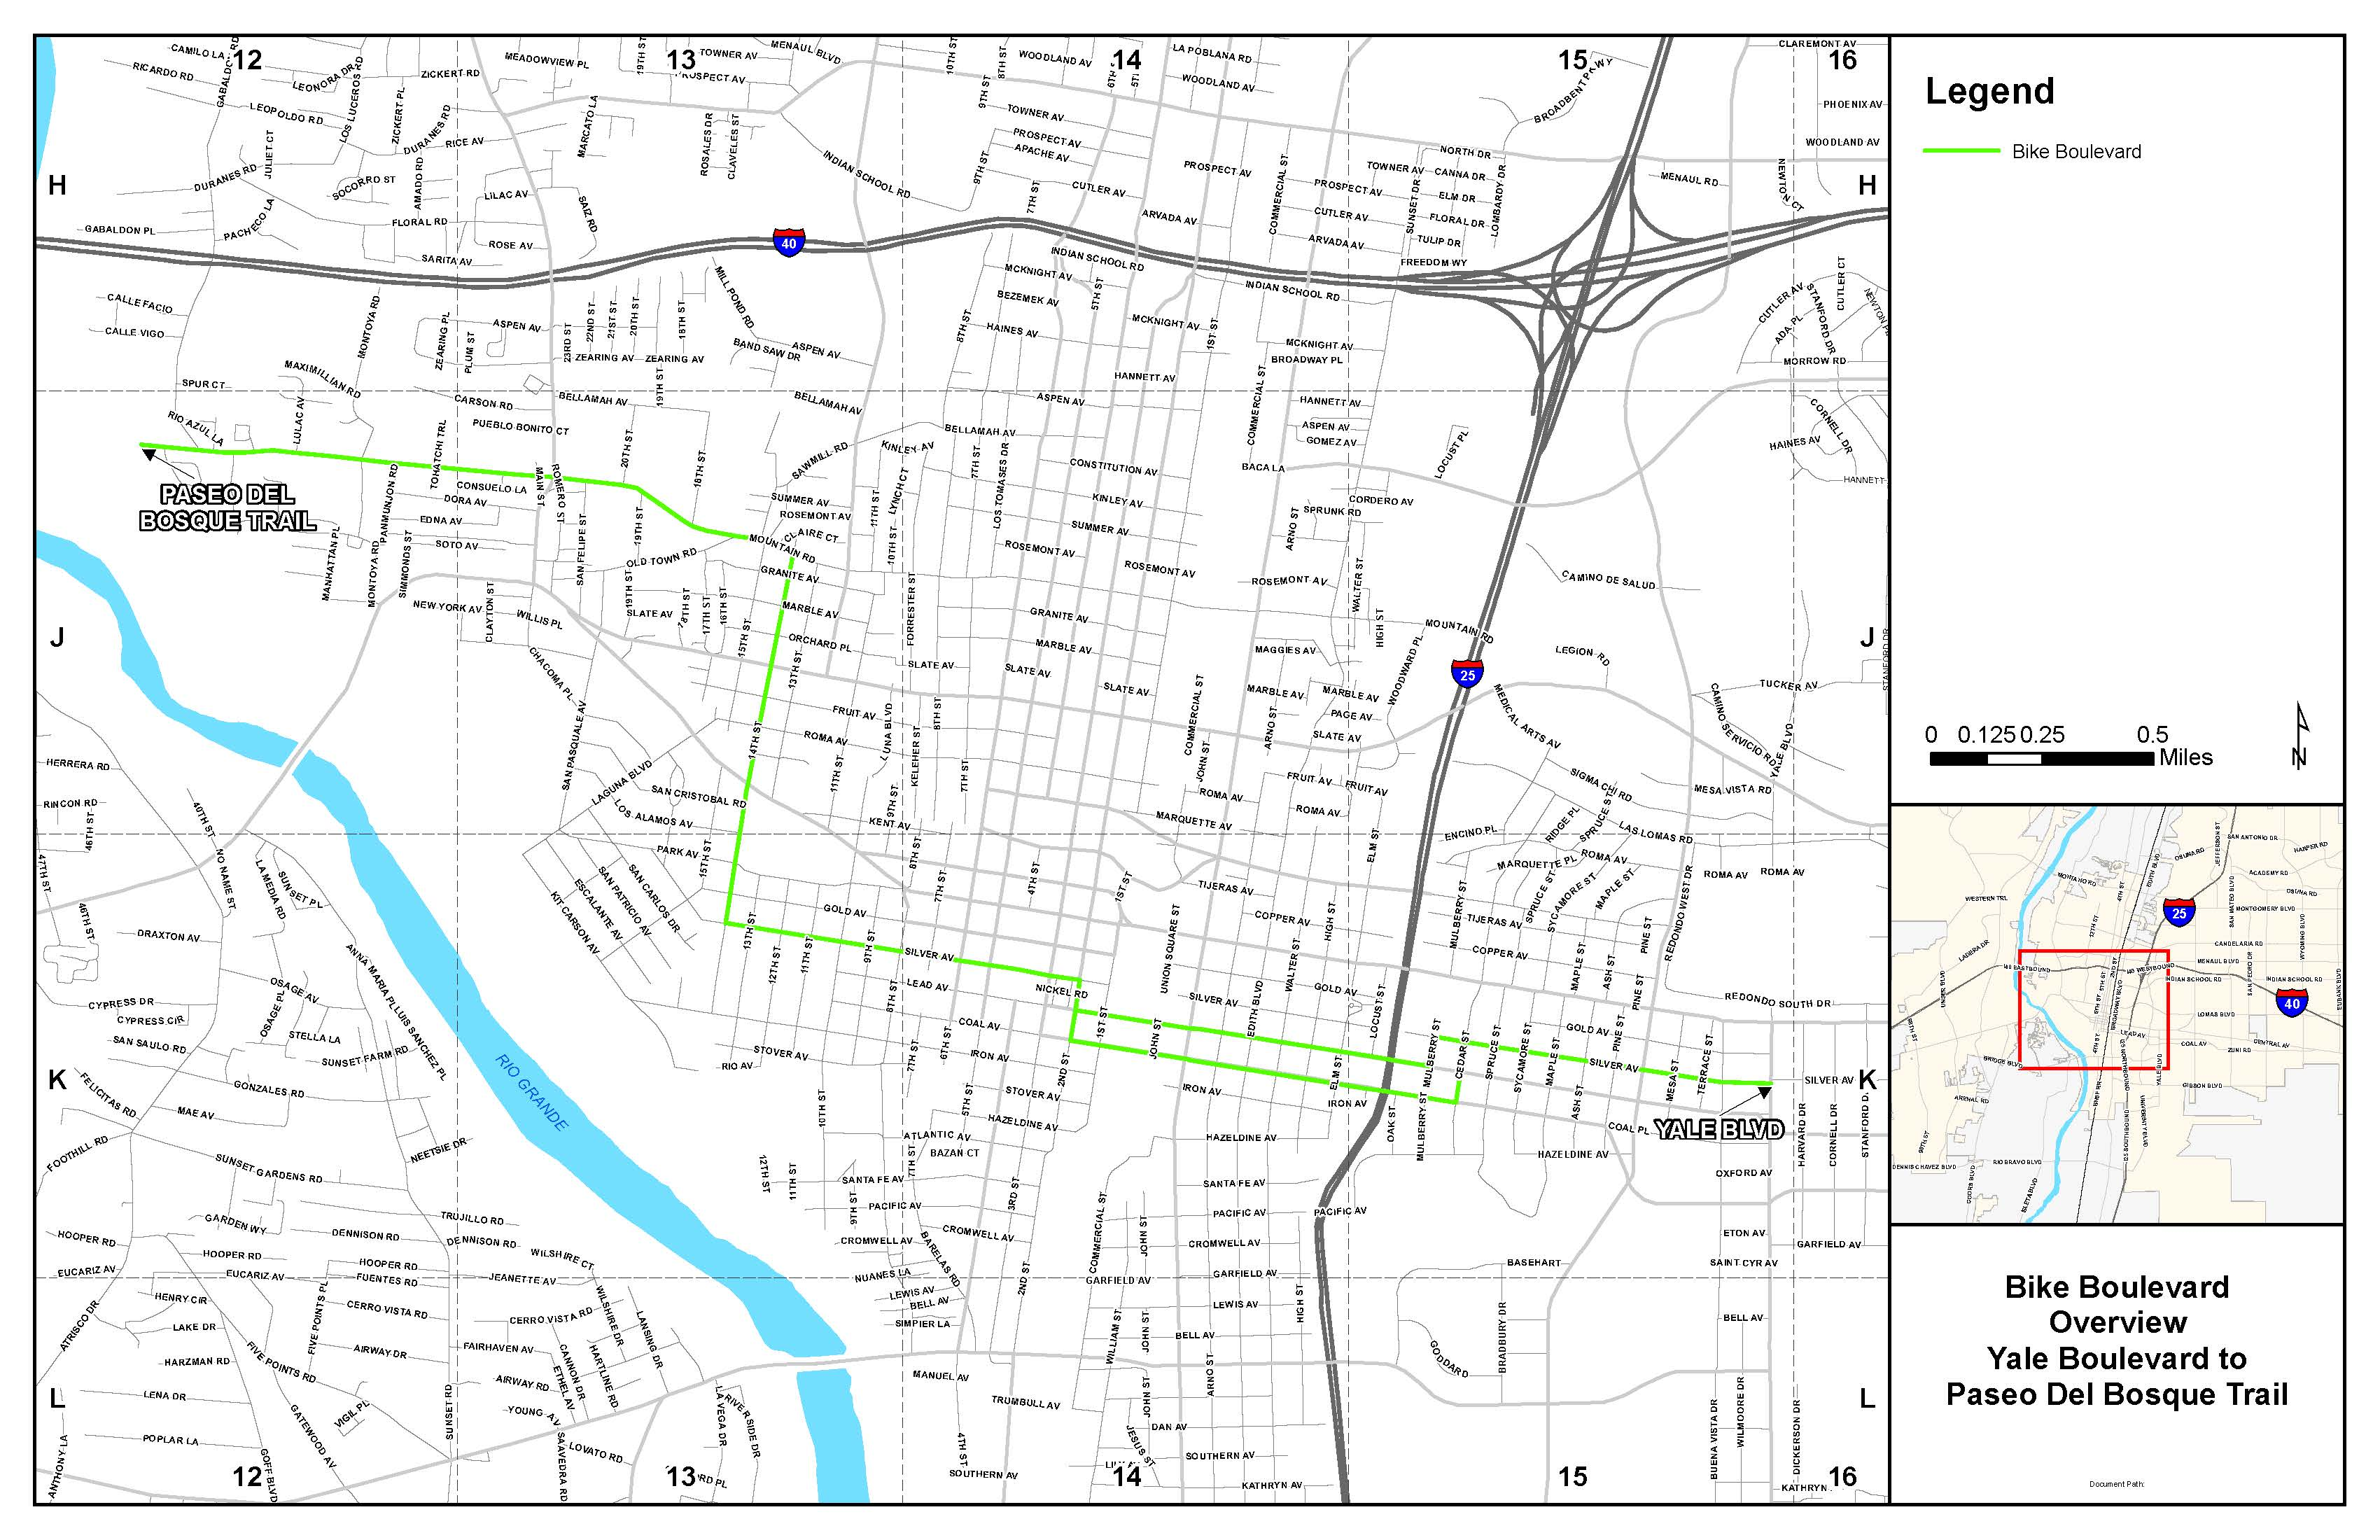 Bike_Boulevard_Yale_Paseo_Del_Bosque_Overview.jpg